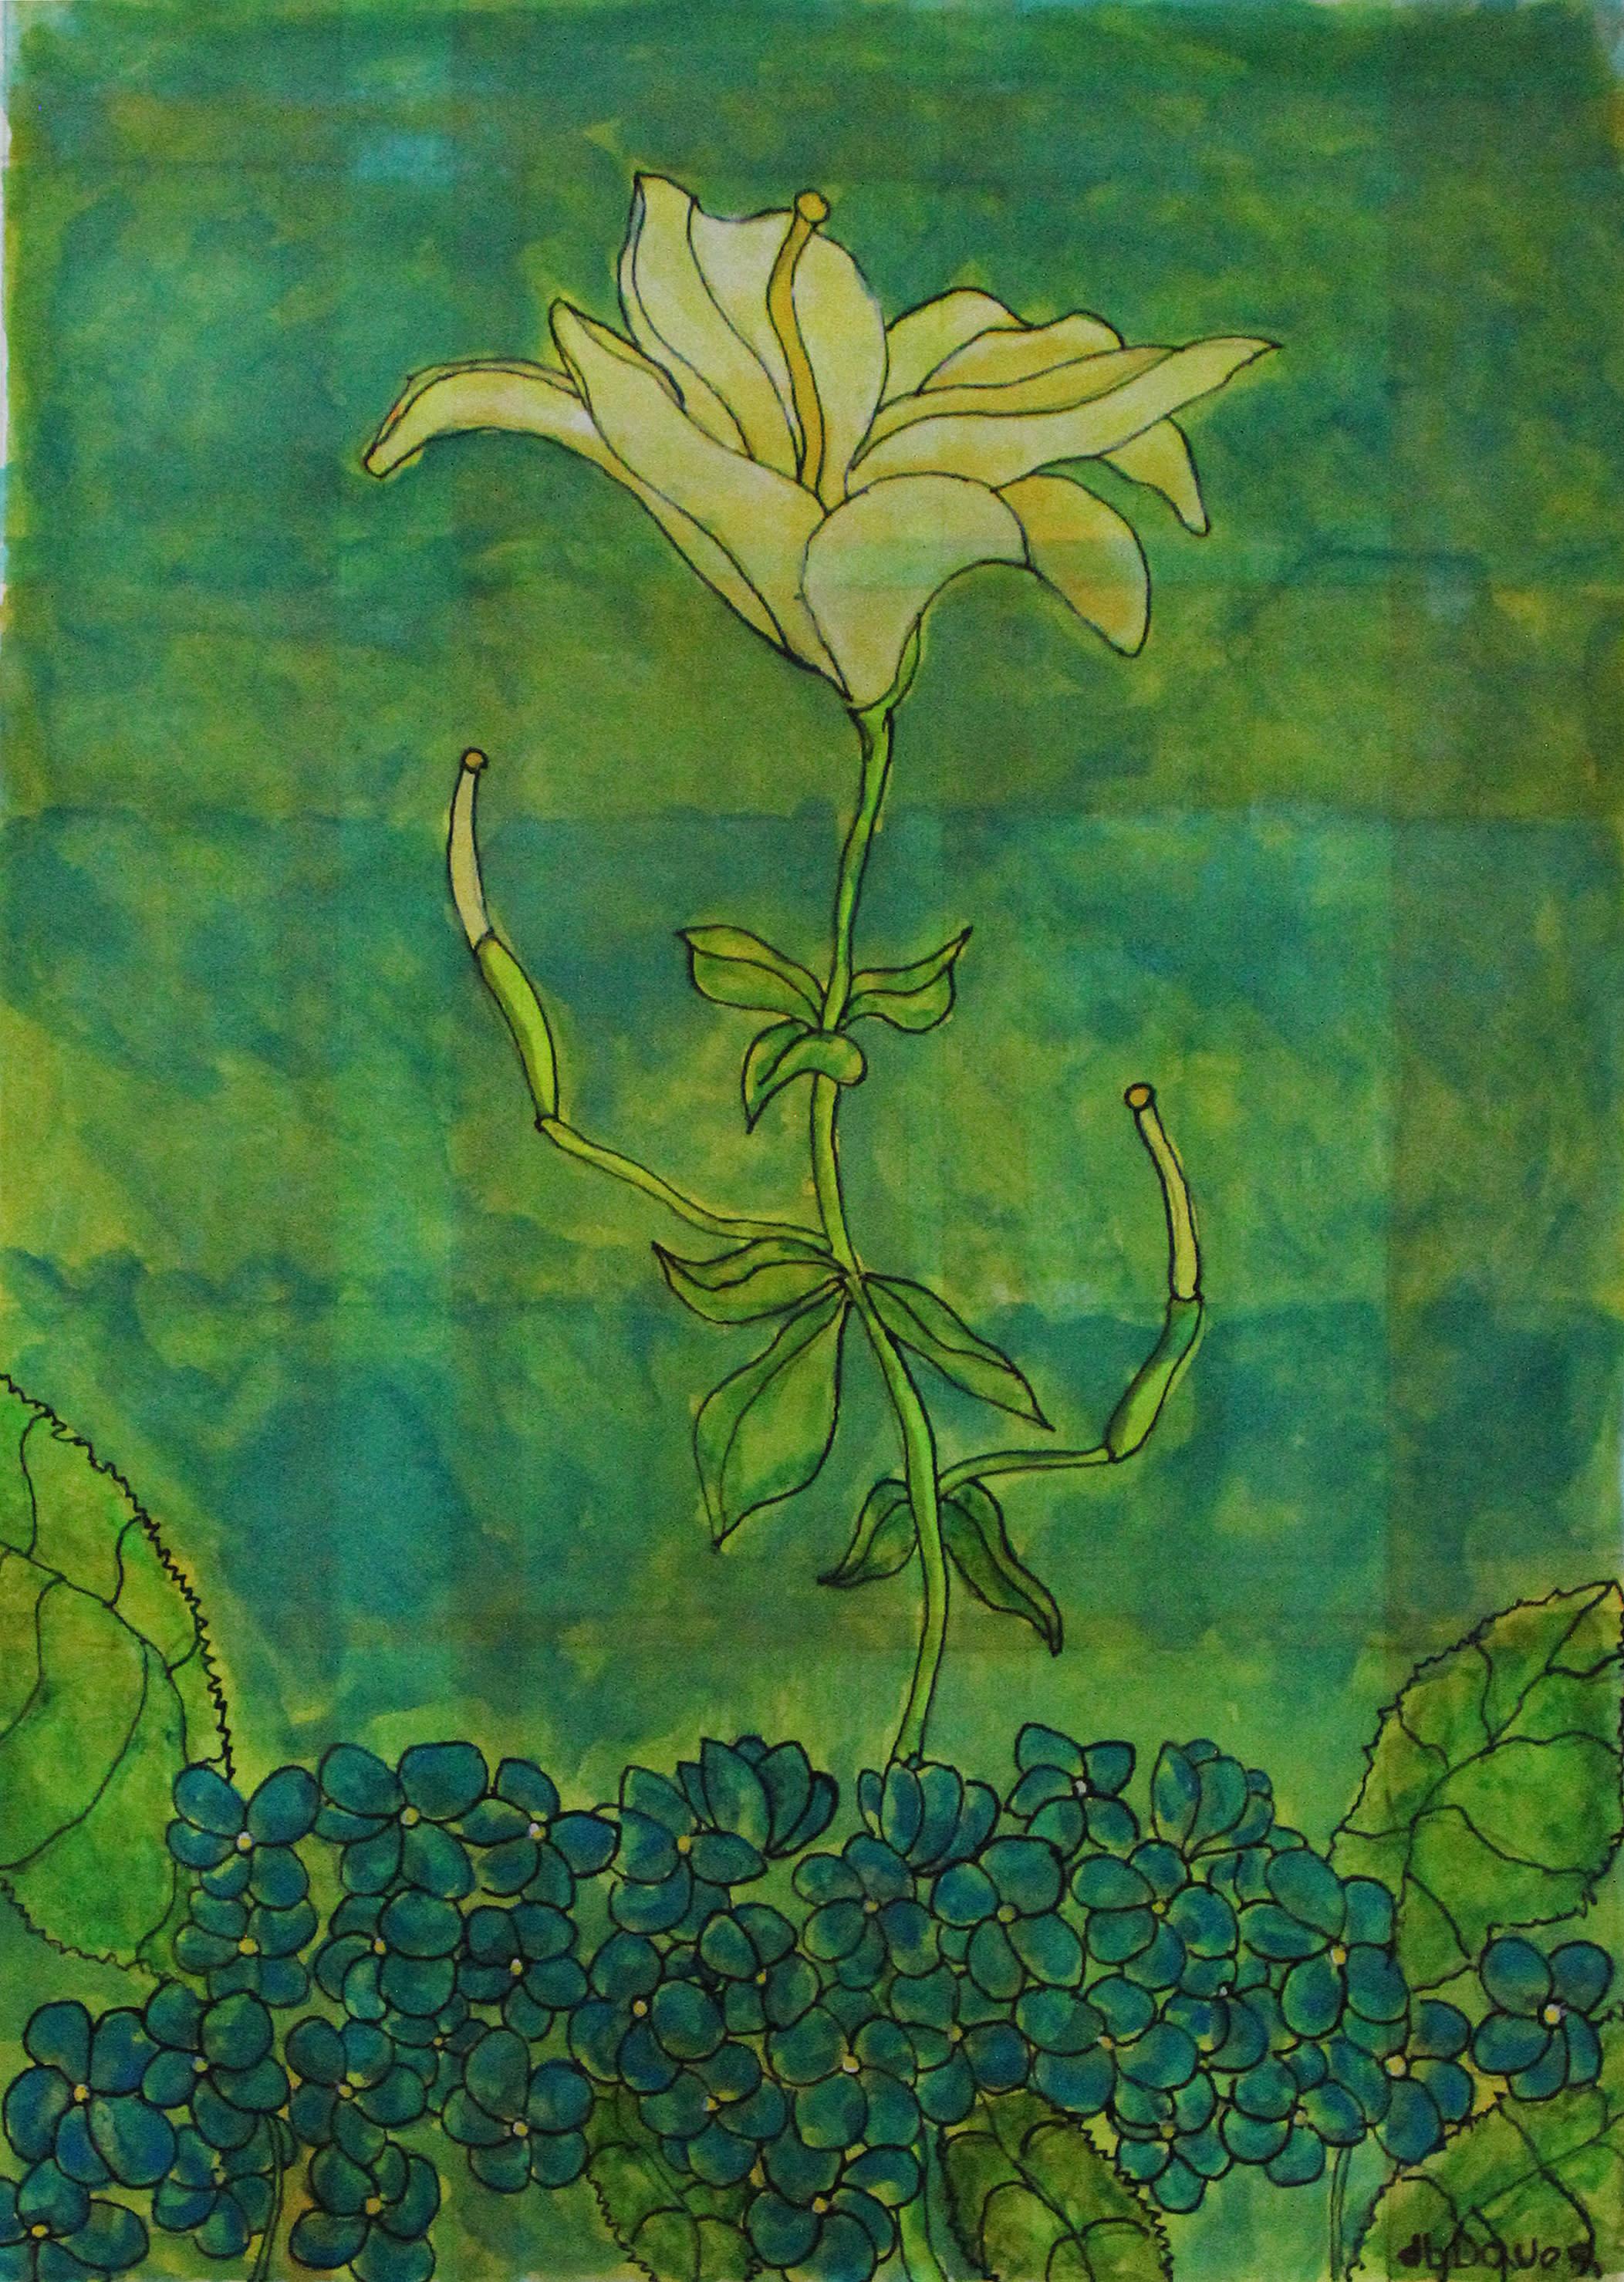 A flower standing alone 18x24  print crop img 9378 maat0p